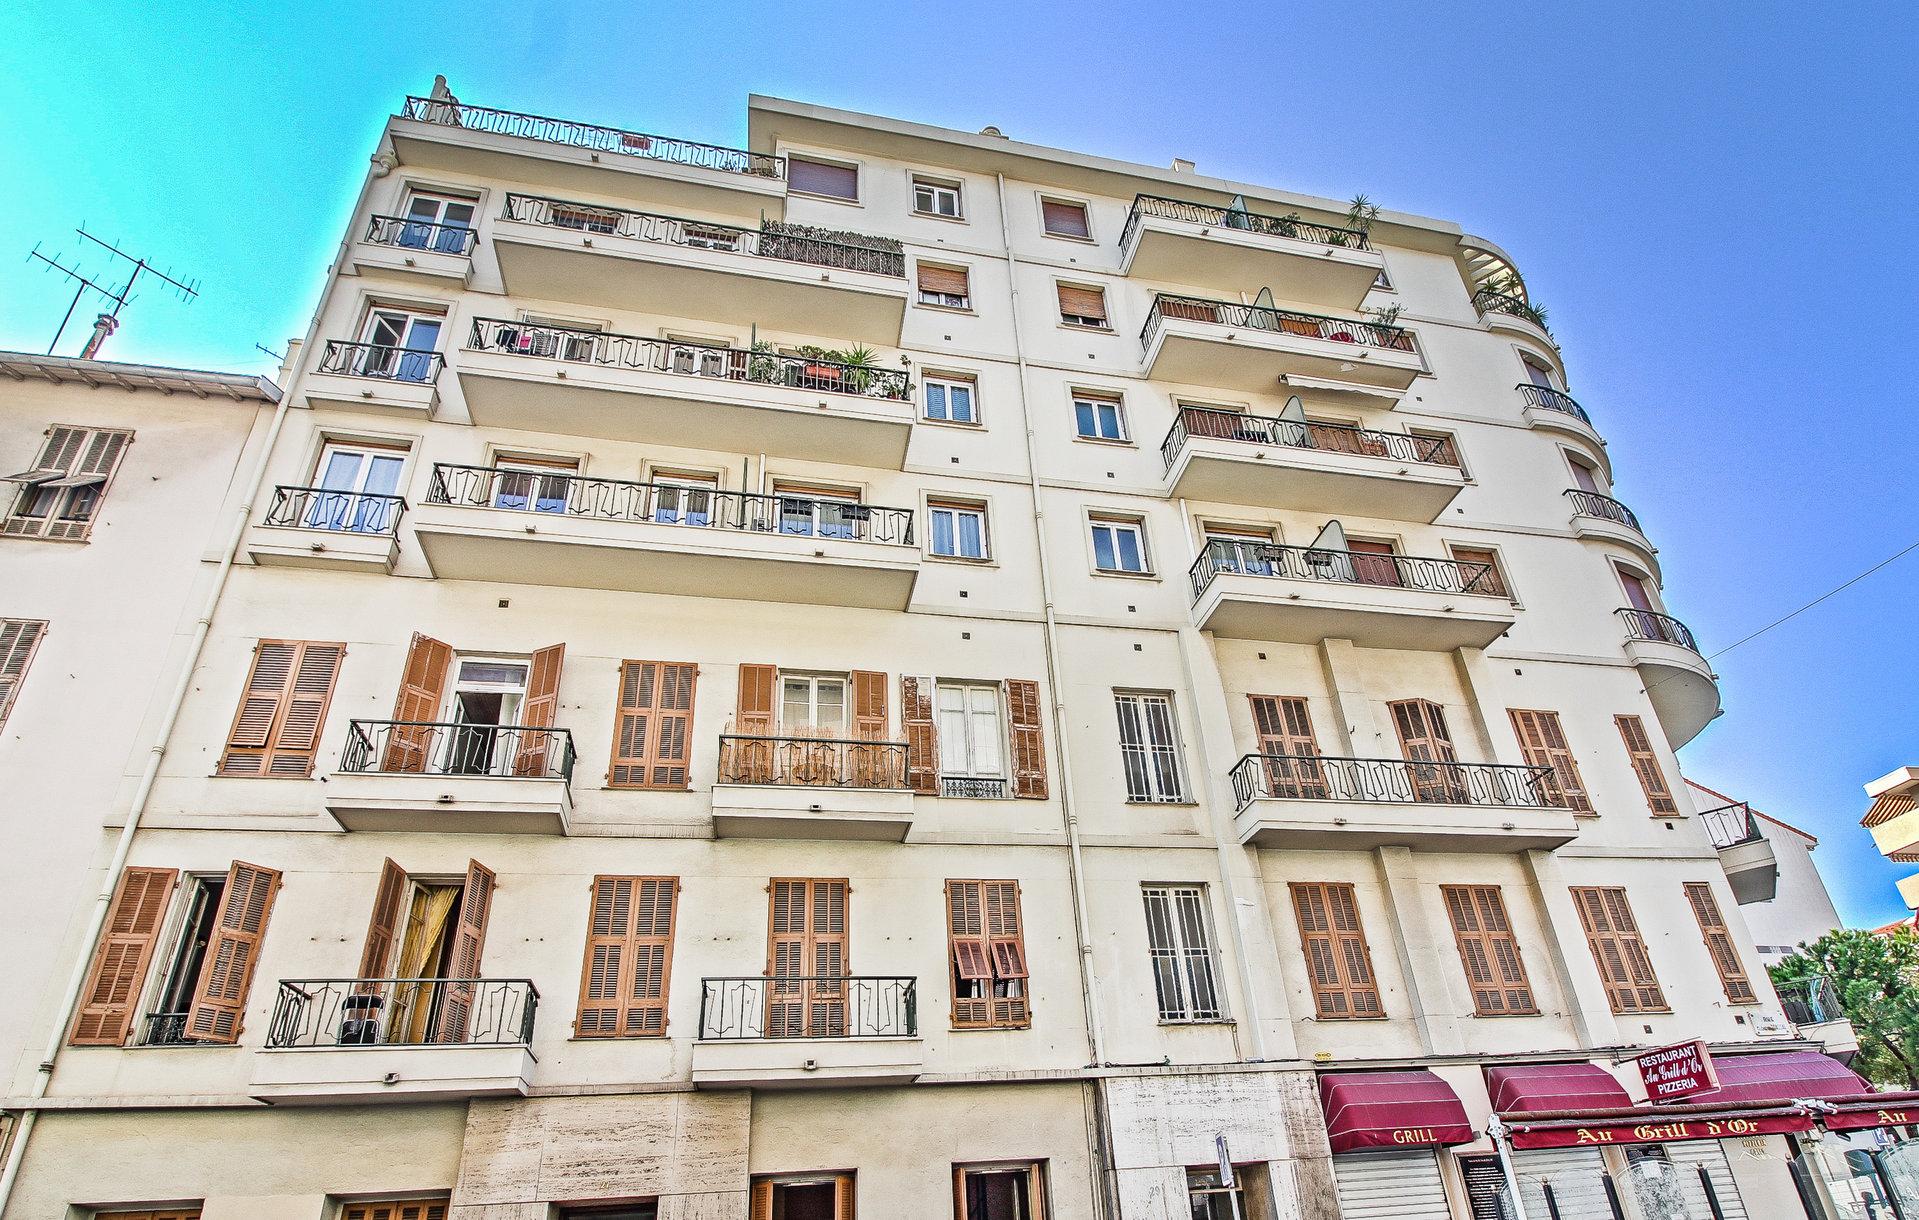 LIBERATION - 2P RdJ - terrasse 20m² - Sud - 170.000€